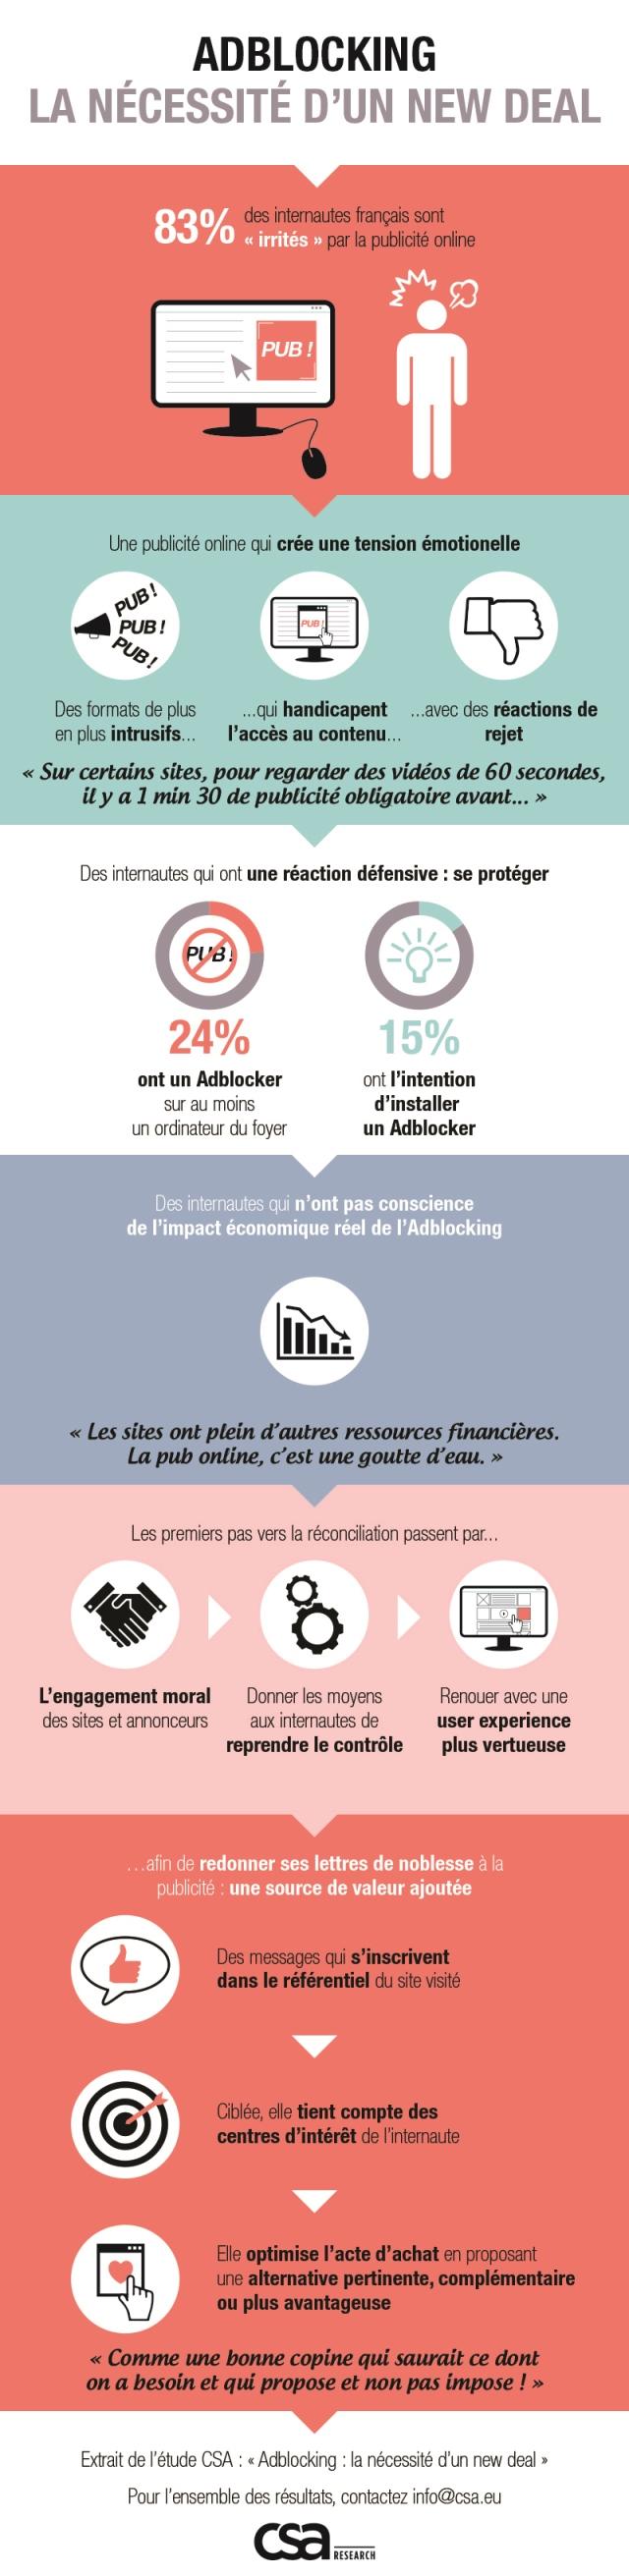 opi20160131-infographie-adblocking-la-necessite-d-un-new-deal